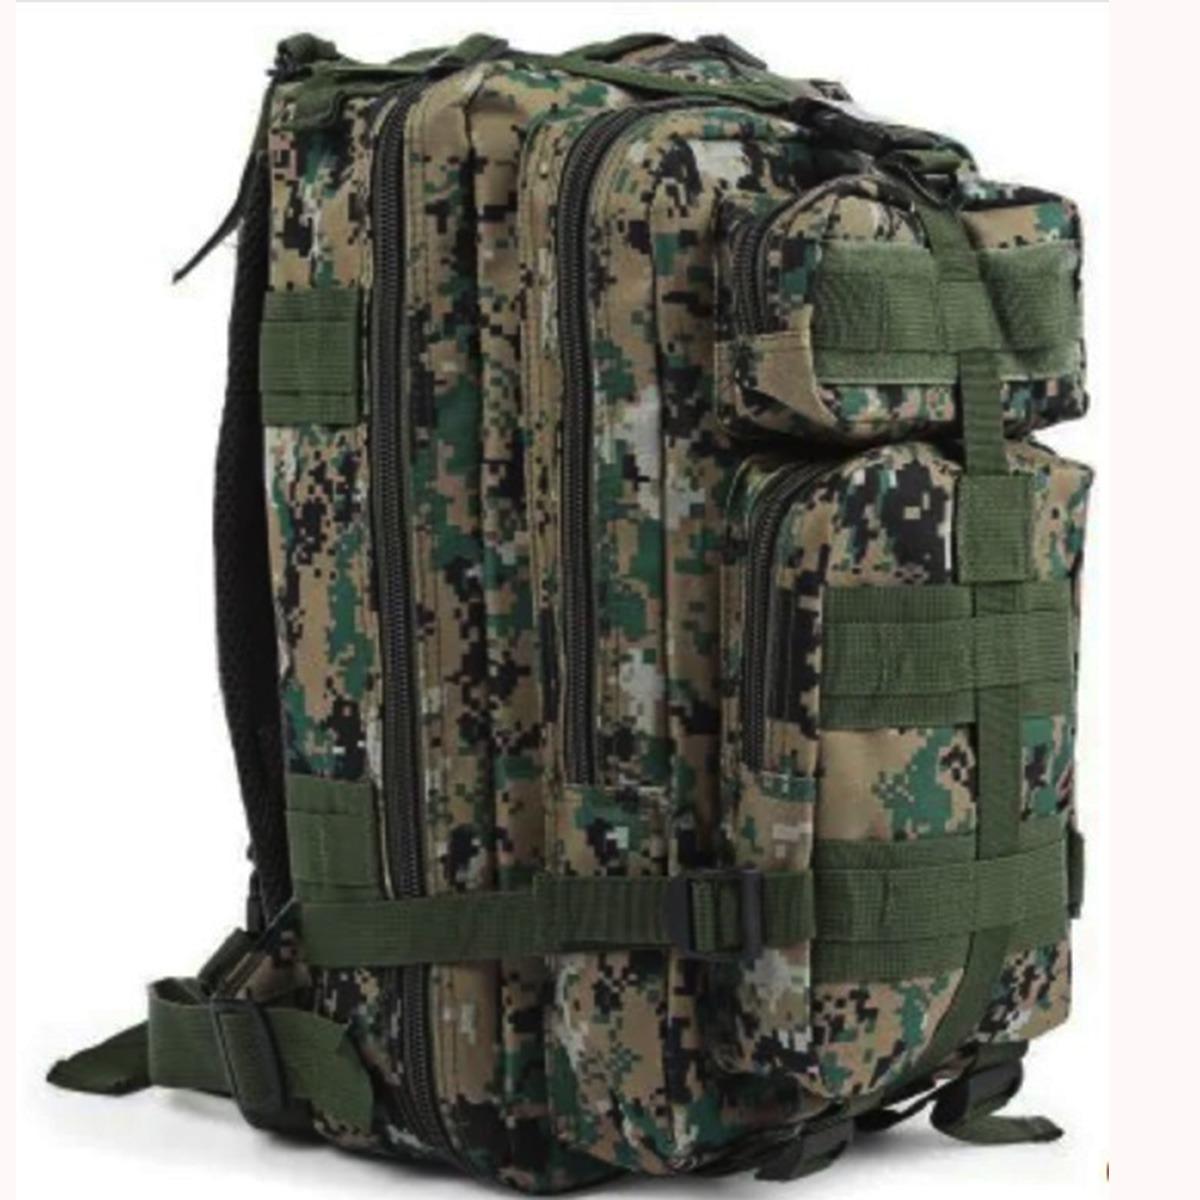 c0c430595 mochila tática militar camuflada digital exercito 30 litros. Carregando  zoom.